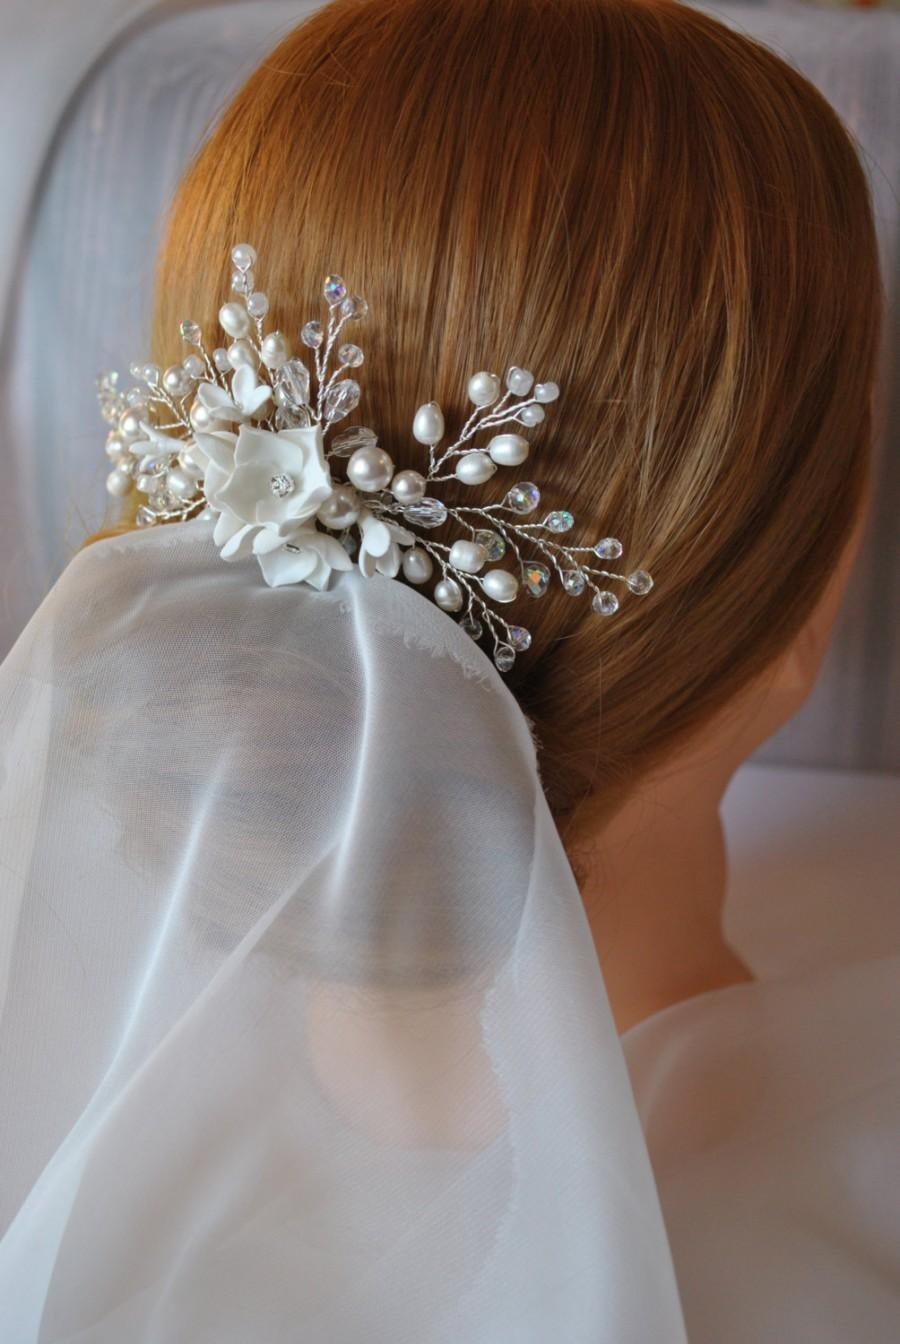 Wedding - Bridal Hair comb Wedding Hair Comb Bridal Headpiece Pearl Hair Comb Crystal Hair Comb Delicate Hair Comb Hair Accessories bridal hair Vine